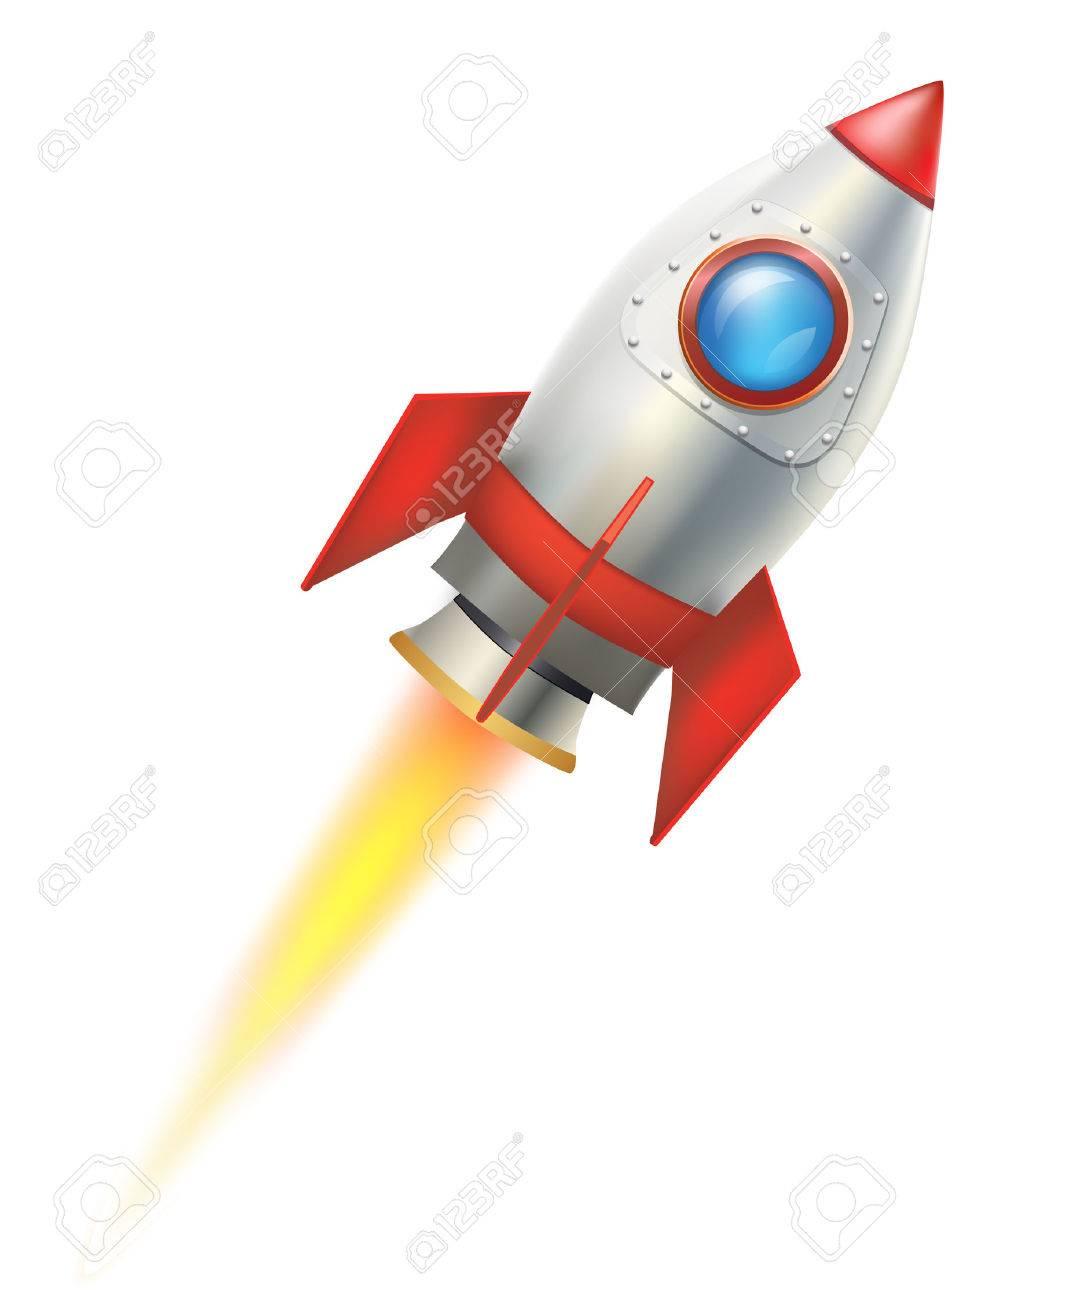 flying rocket on white background. vector illustration - 50086533